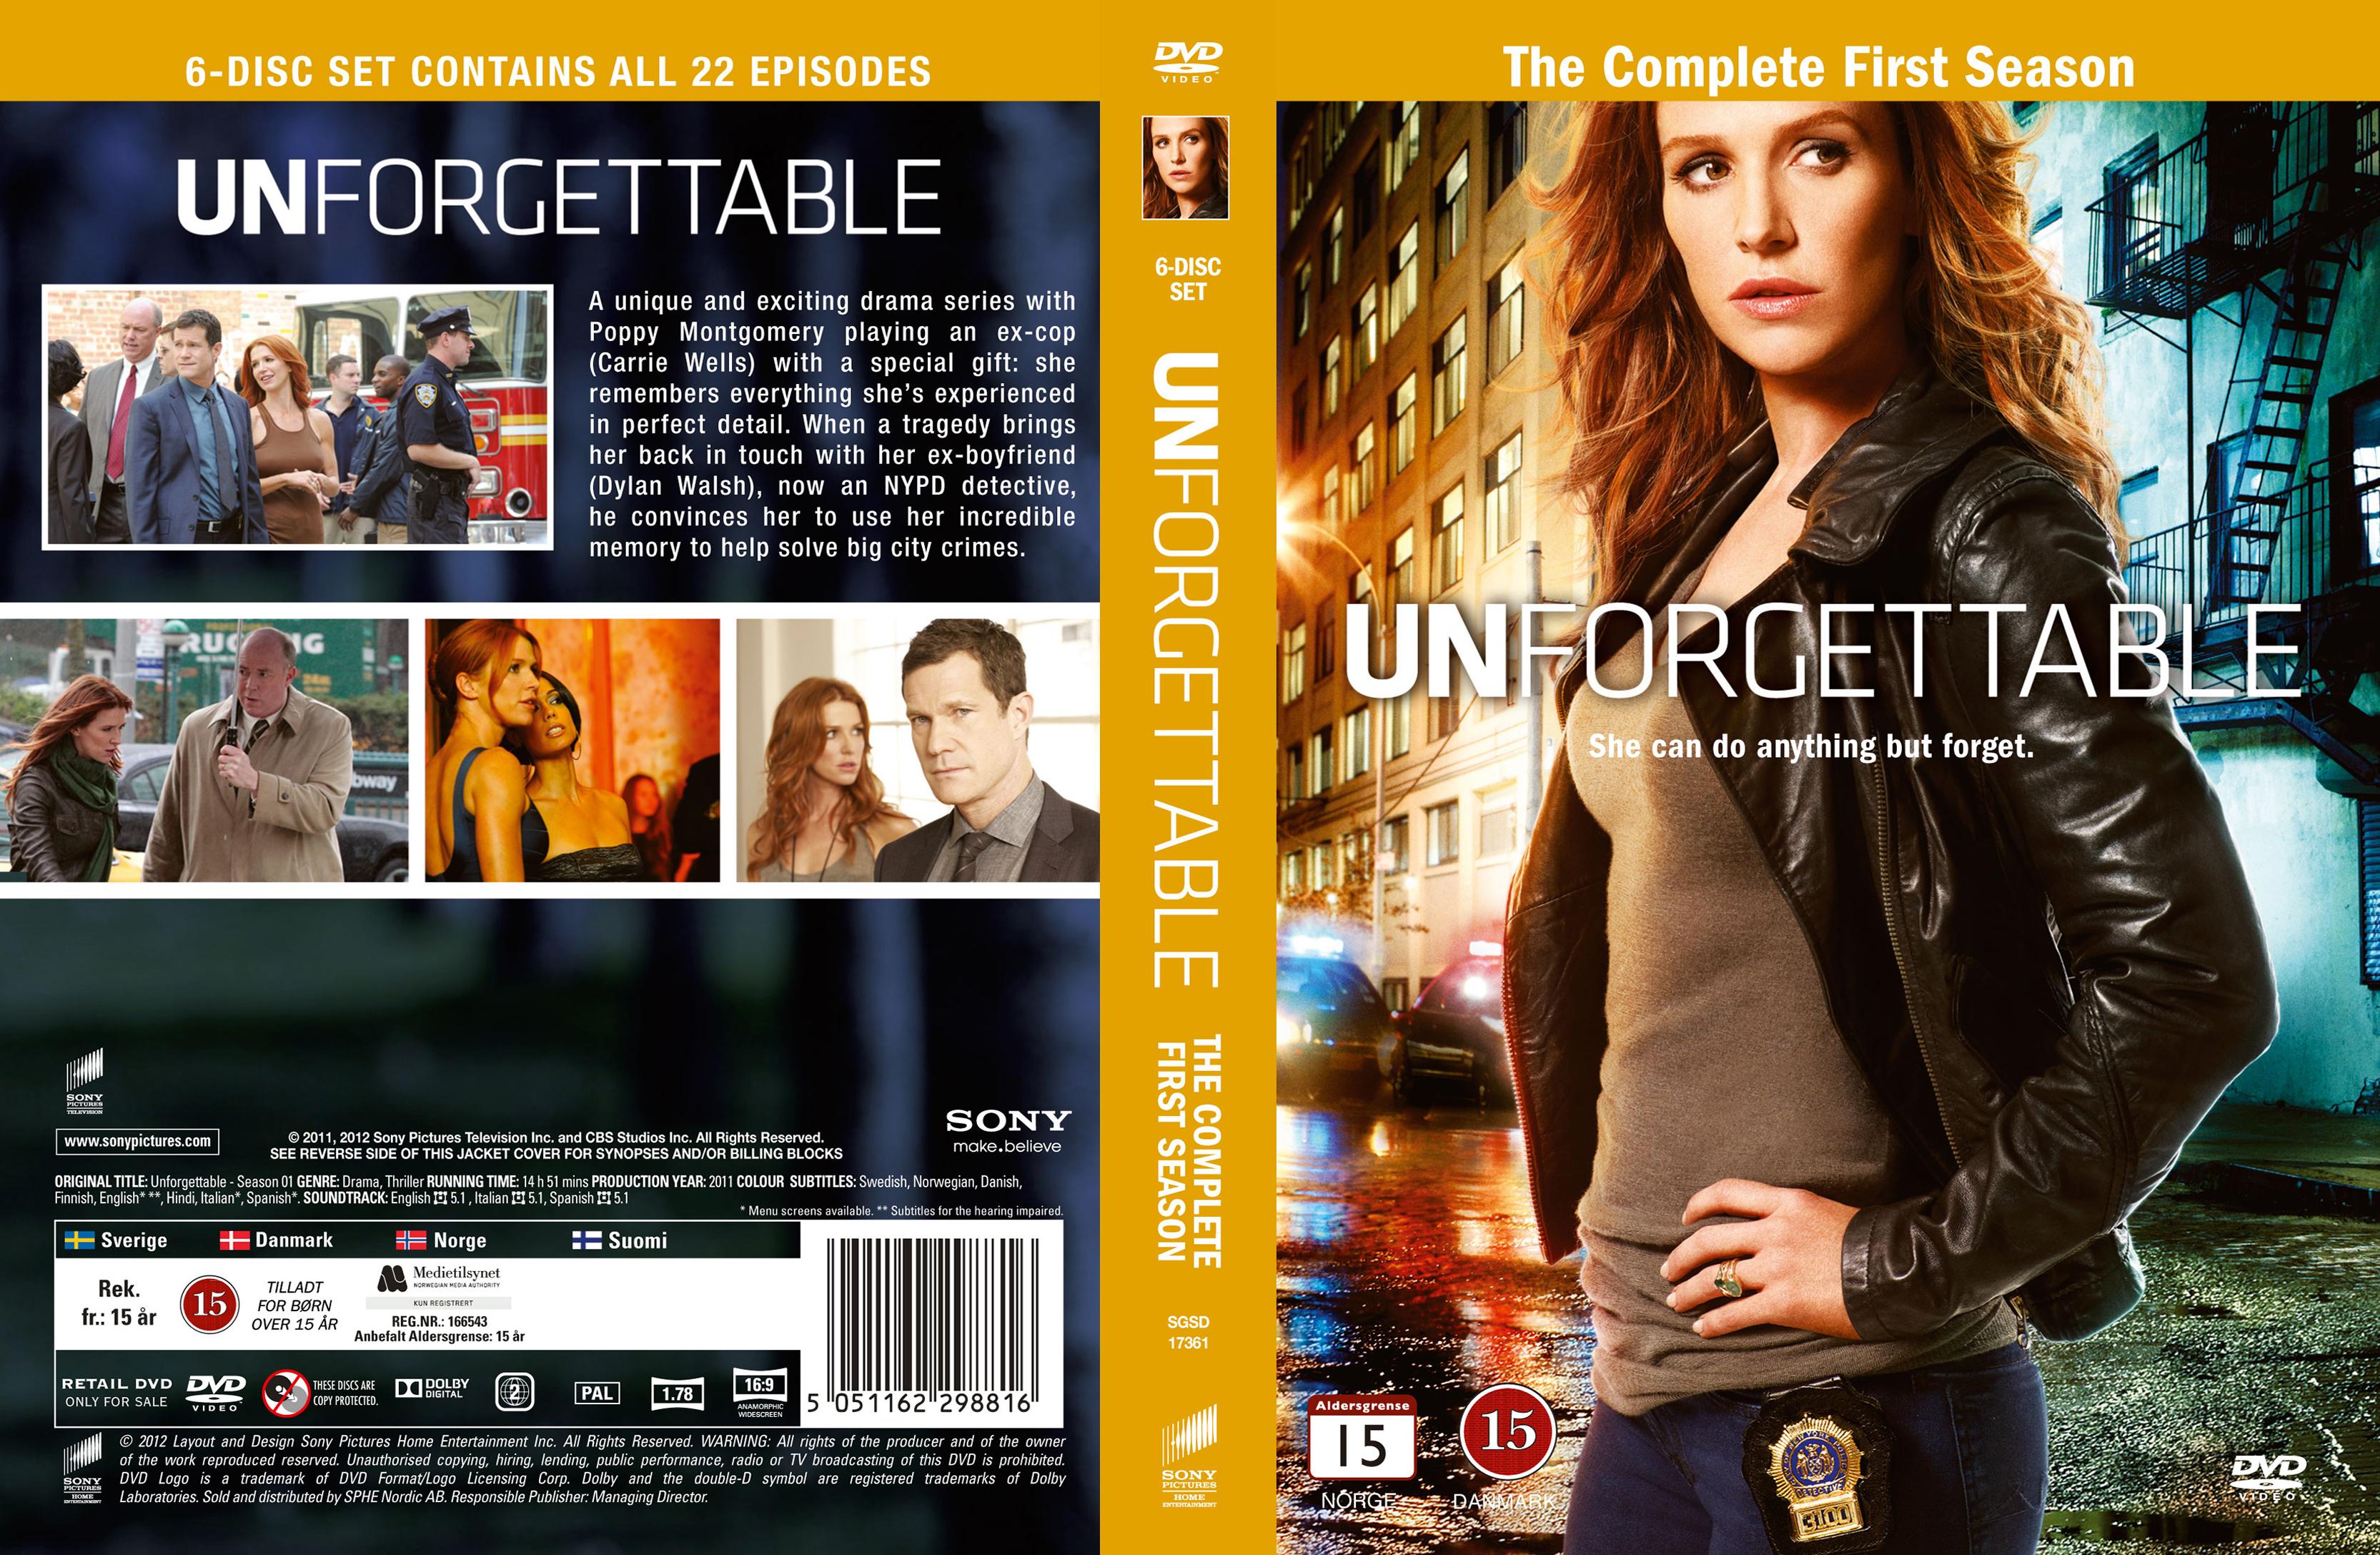 unforgettable season 1 download